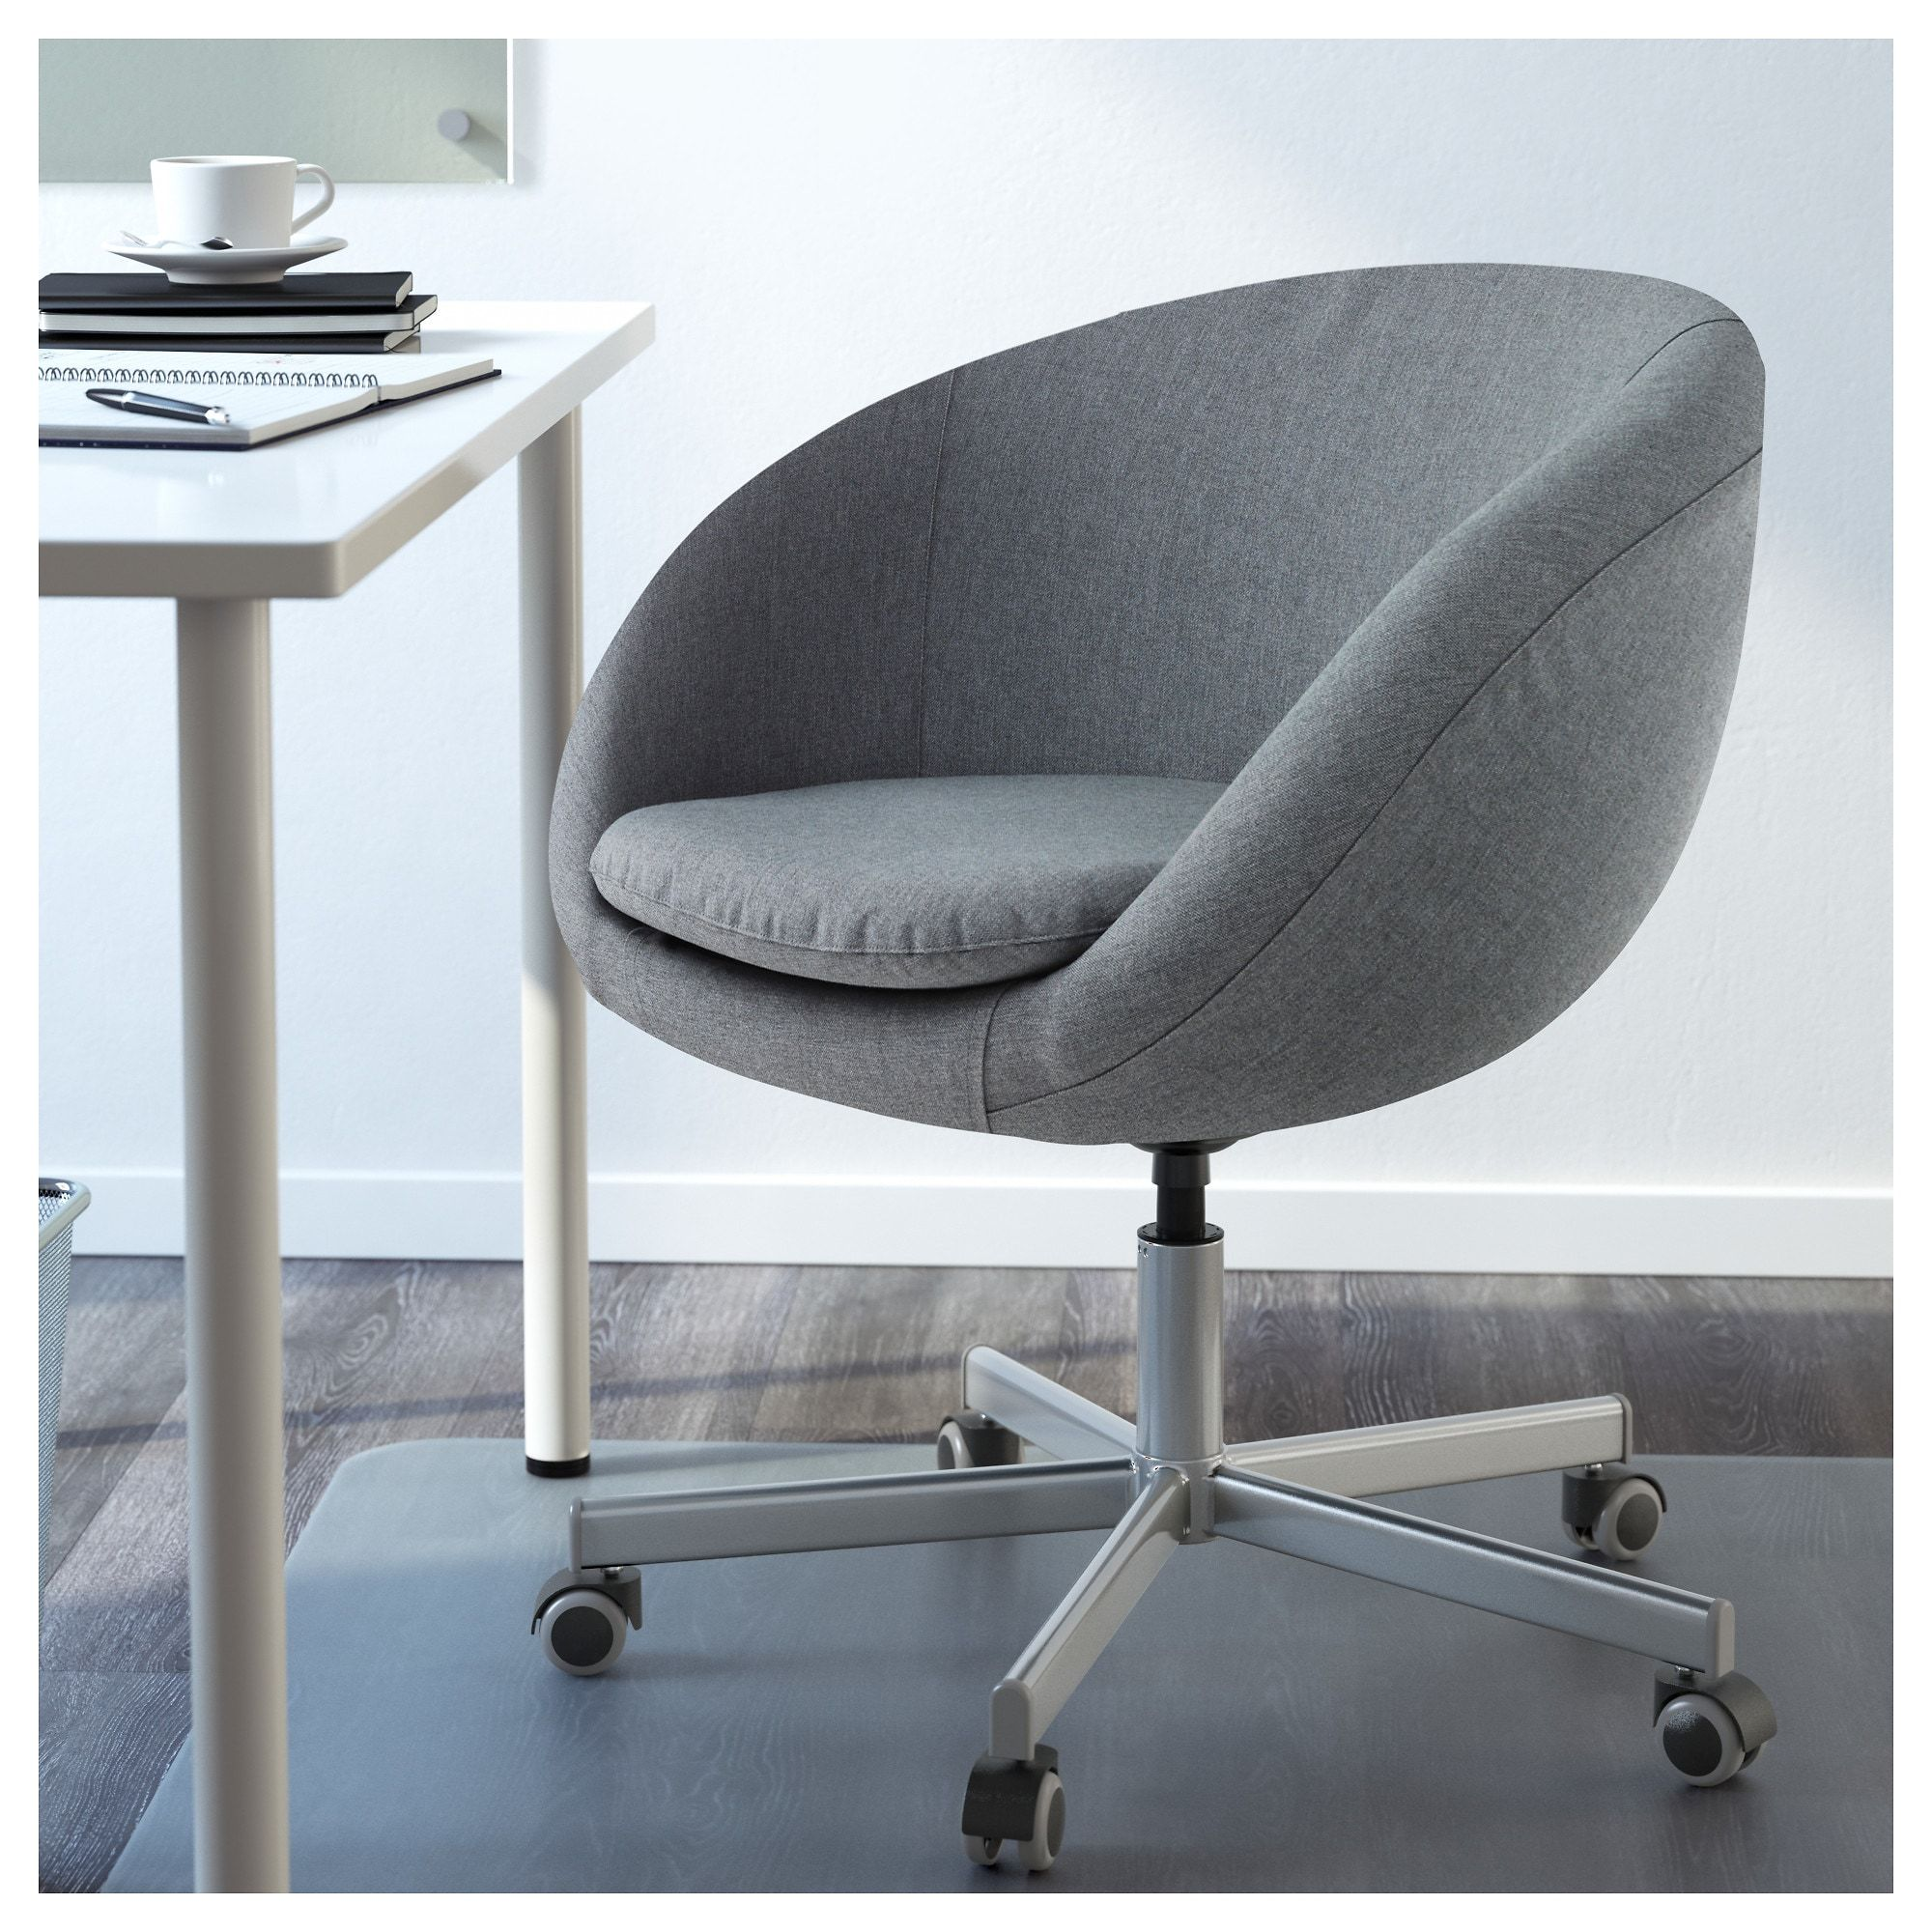 IKEA - SKRUVSTA Swivel chair Vissle gray | study chair in ...